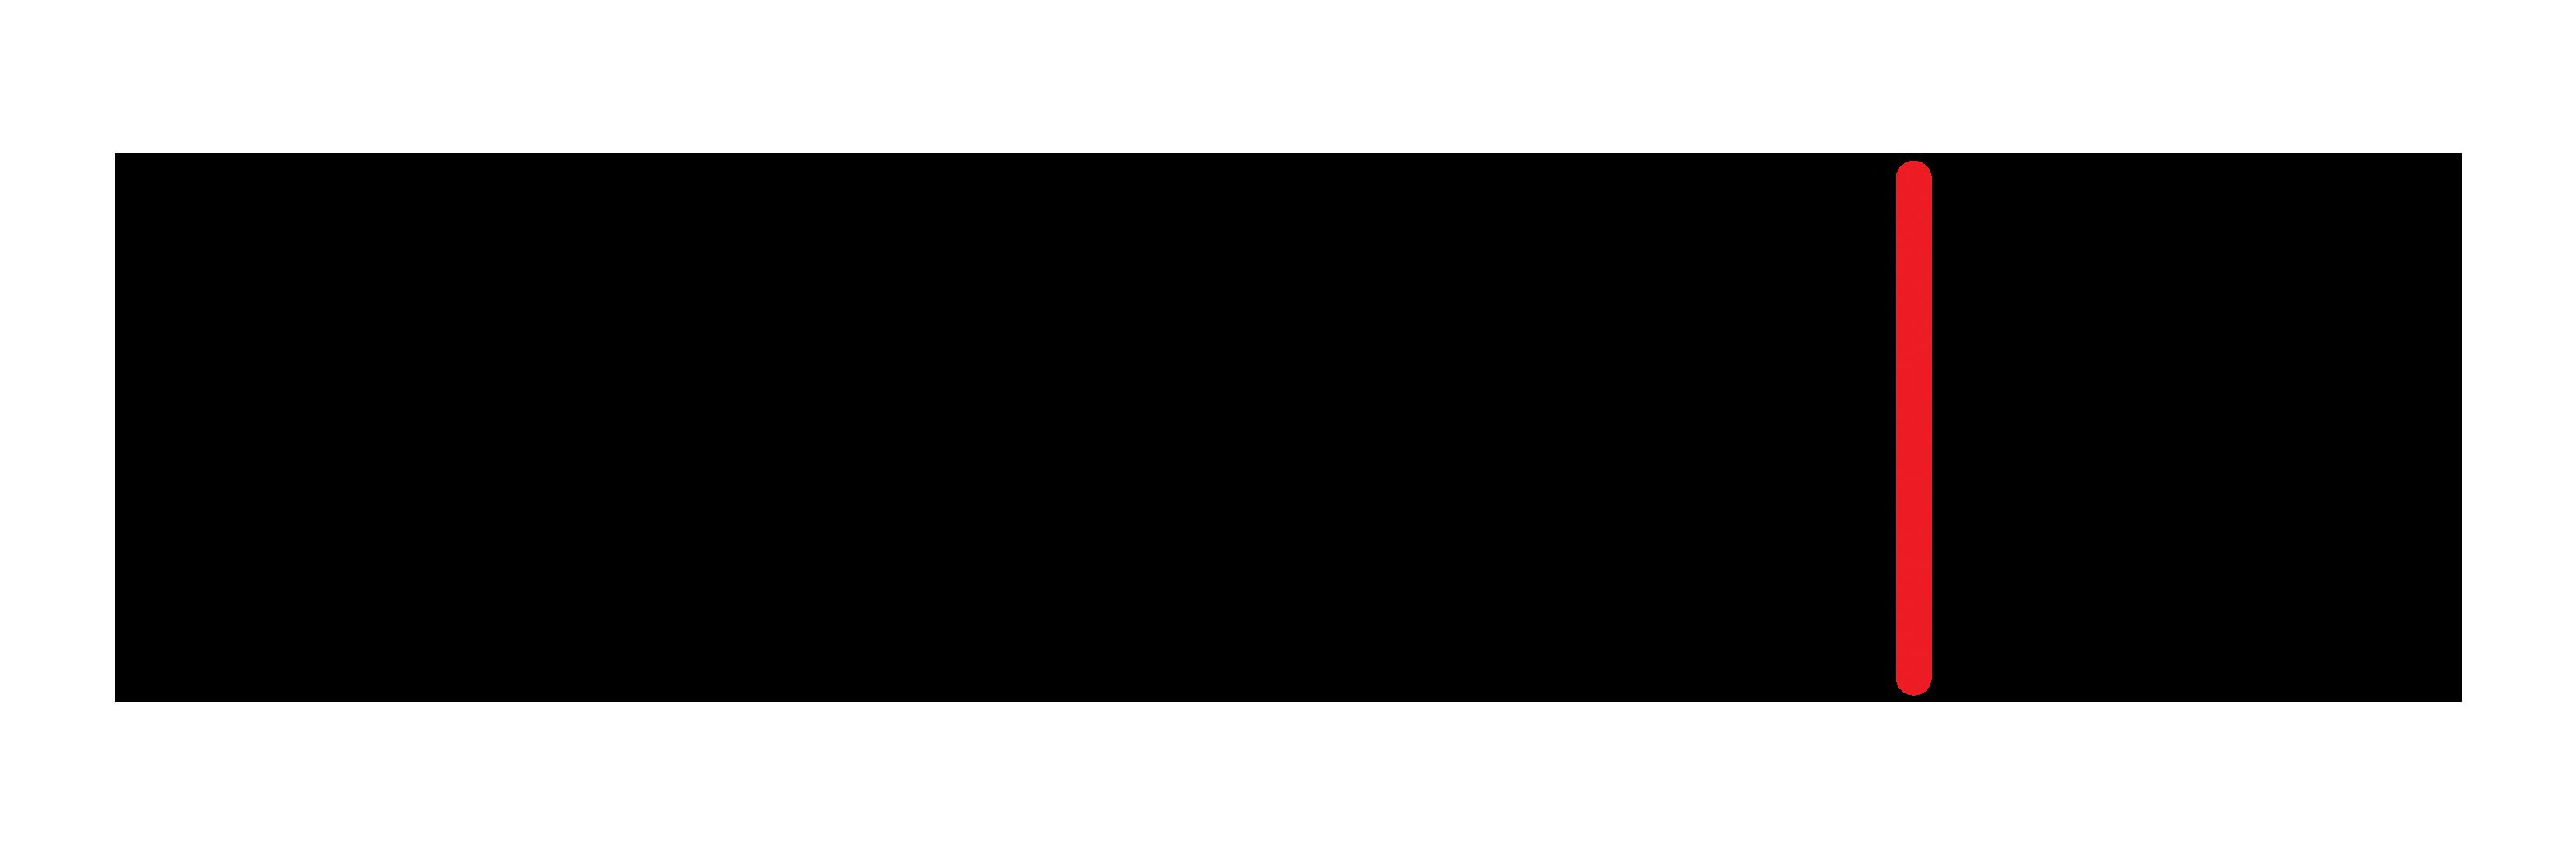 Opsis Black Text Logo